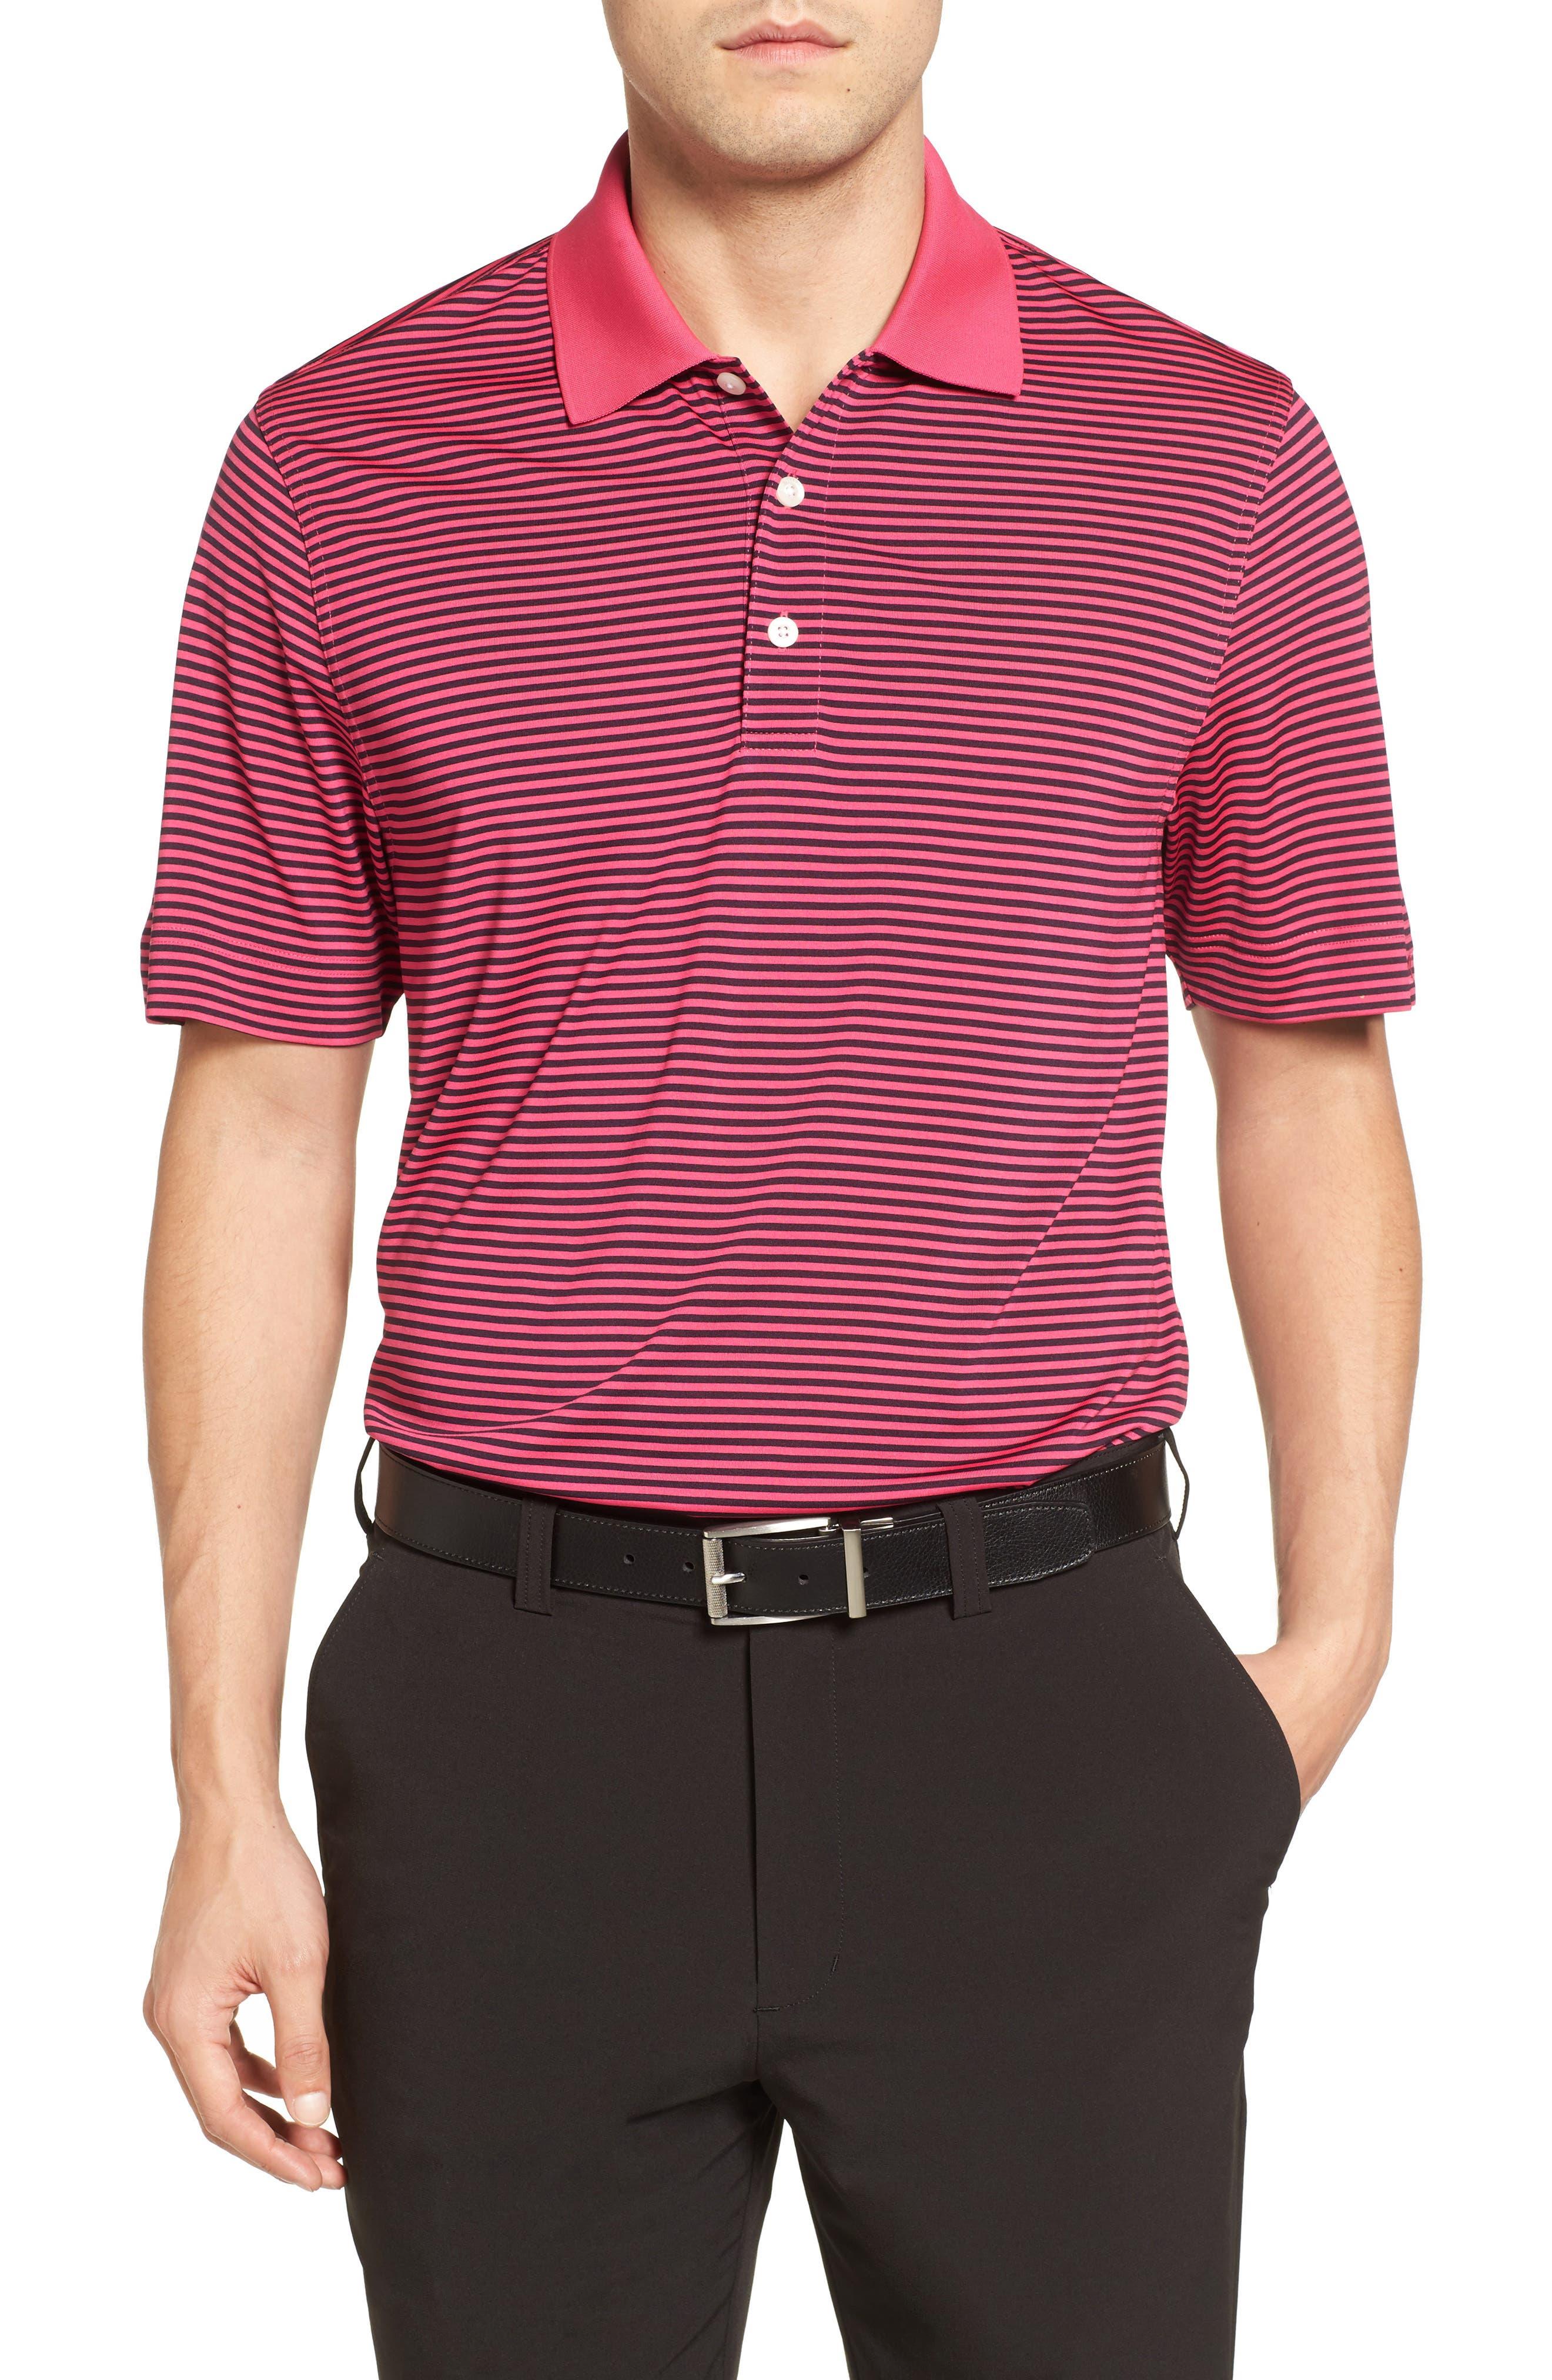 Cutter & Buck Trevor Stripe Drytec Polo, Pink